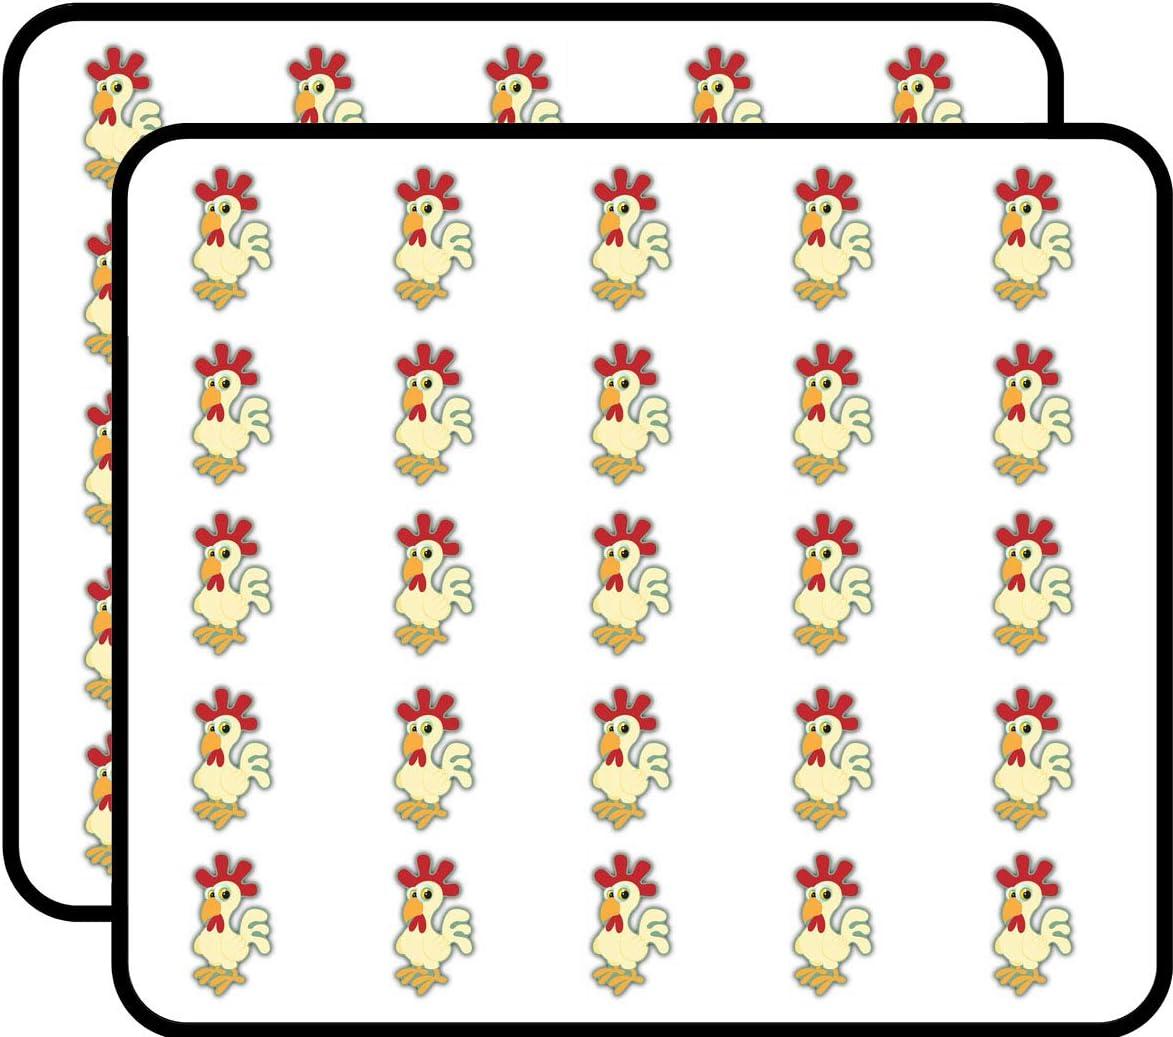 Cock View Funny Chicken Food Sticker for Scrapbooking, Calendars, Arts, Kids DIY Crafts, Album, Bullet Journals 50 Pack